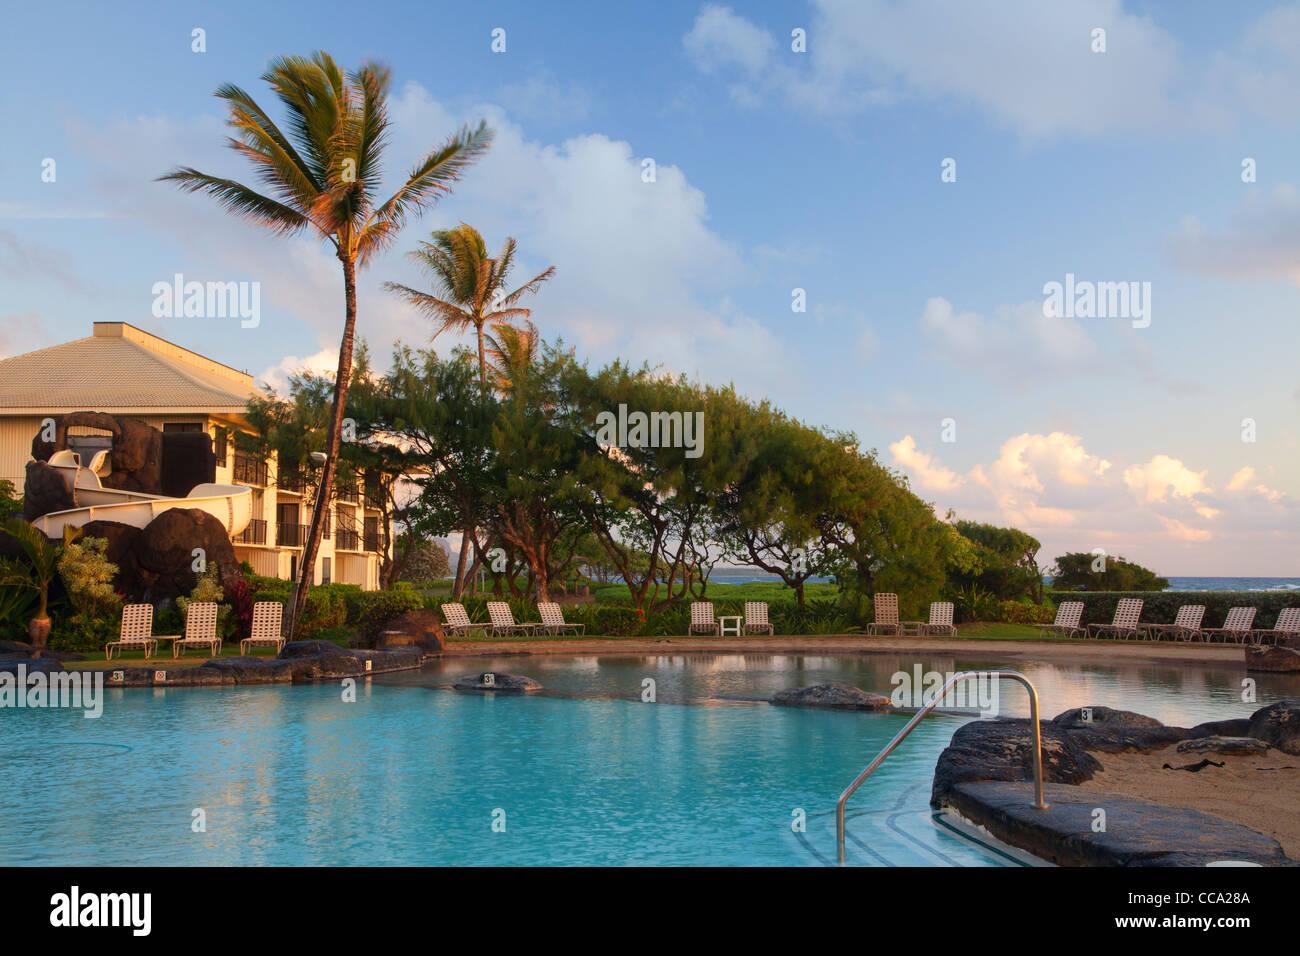 Kauai Beach Resort Stock Photos & Kauai Beach Resort Stock Images ...